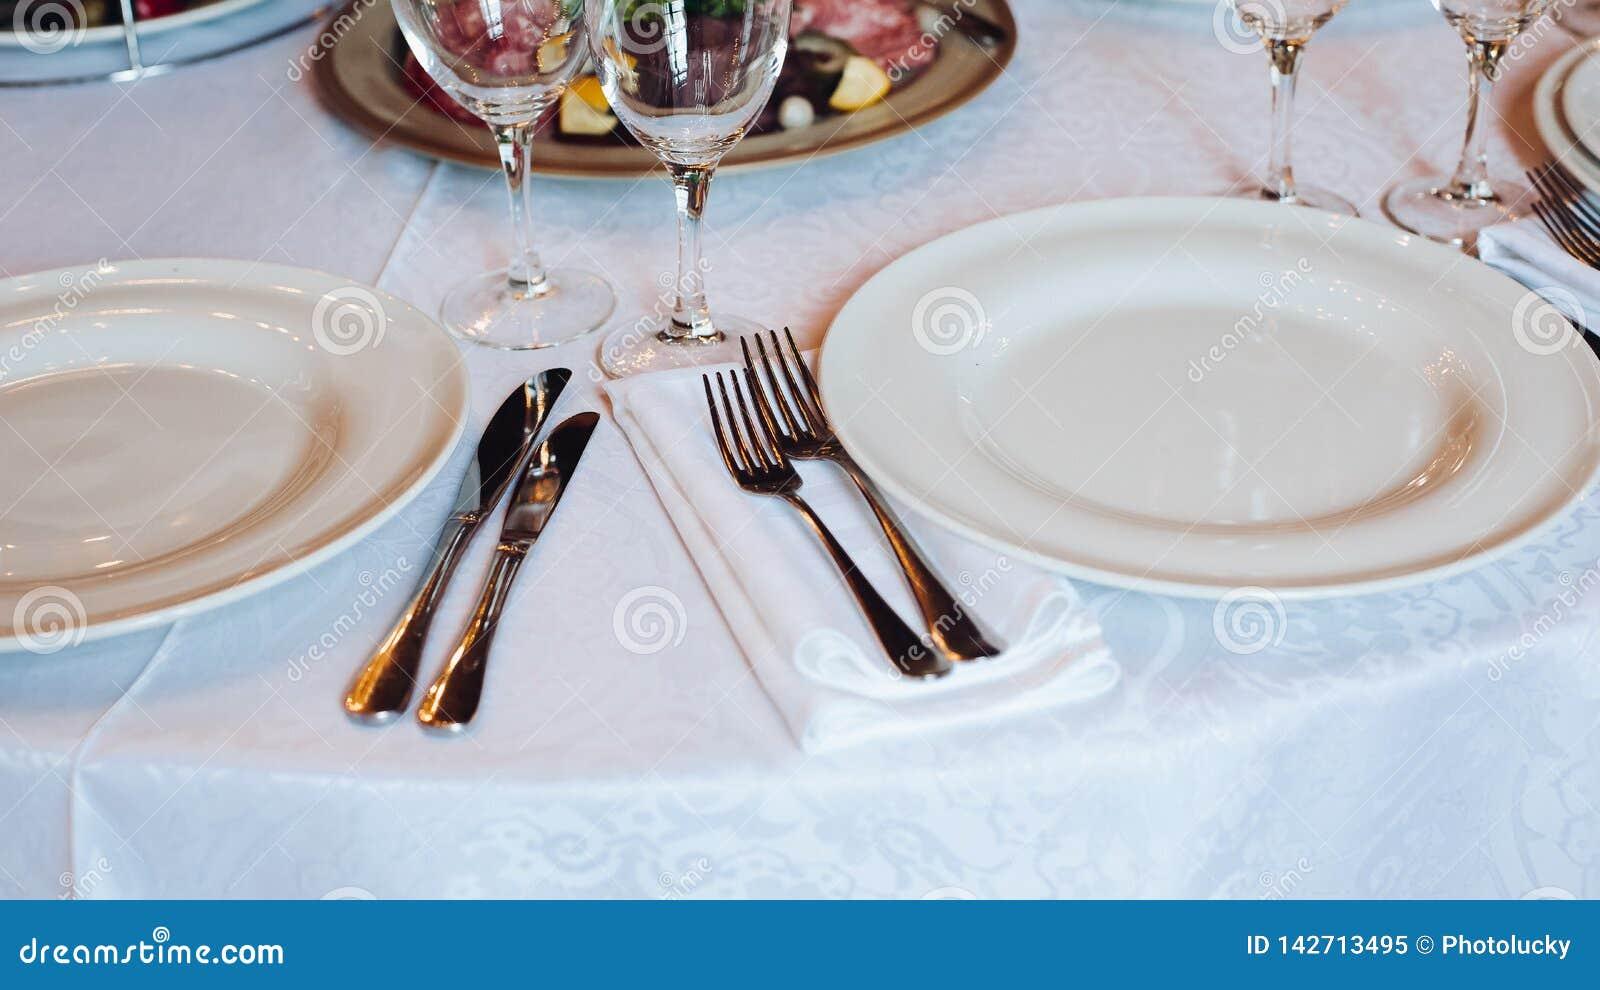 Several snacks served on birthday party or wedding celebration.